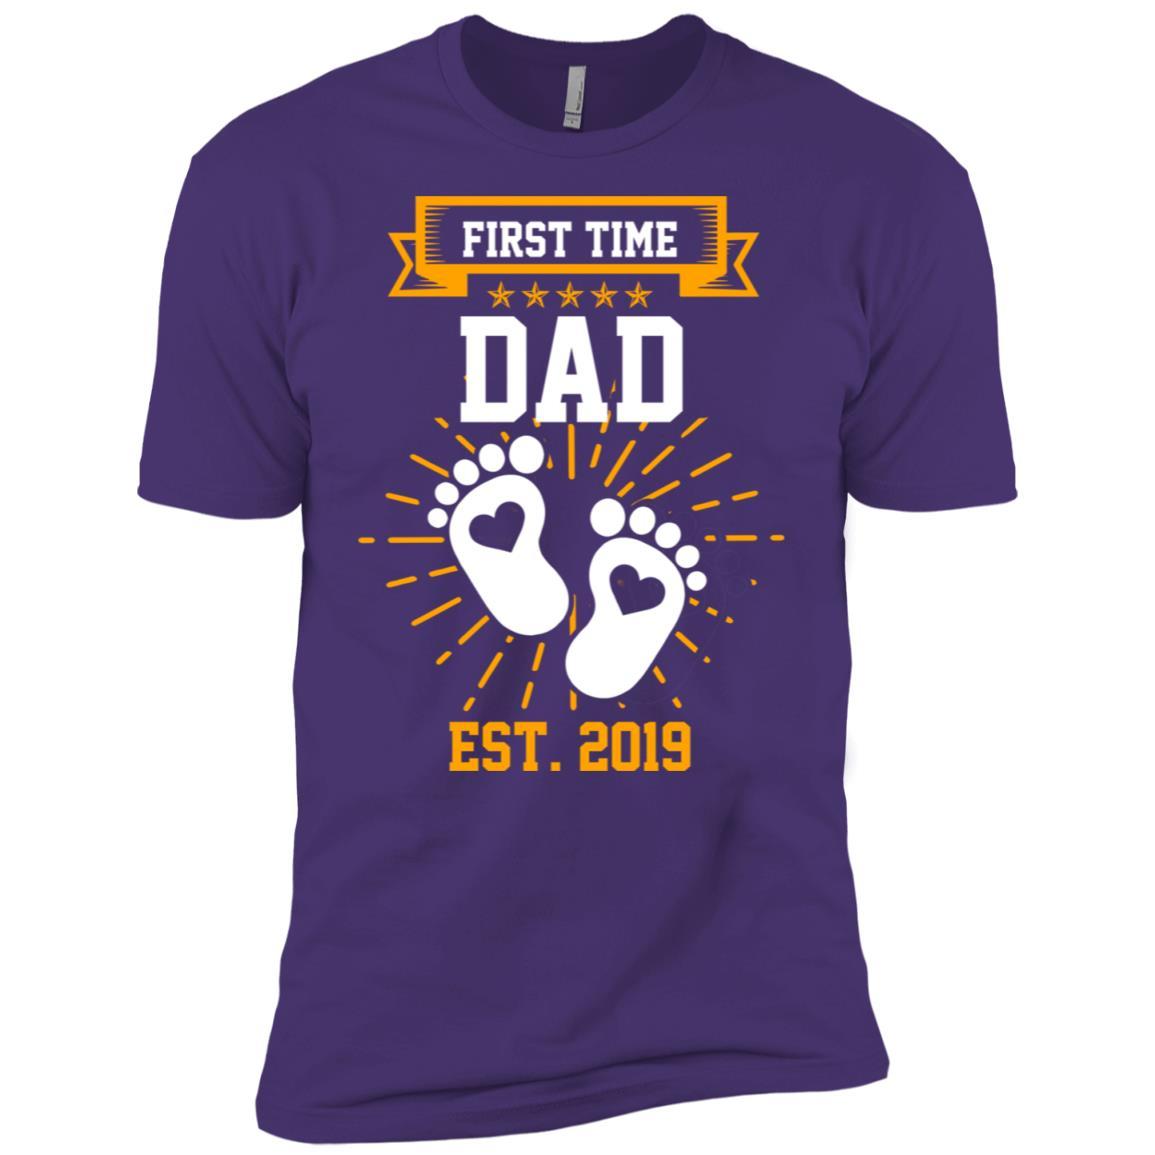 First Time Dad Est 2019 Gift Men Short Sleeve T-Shirt